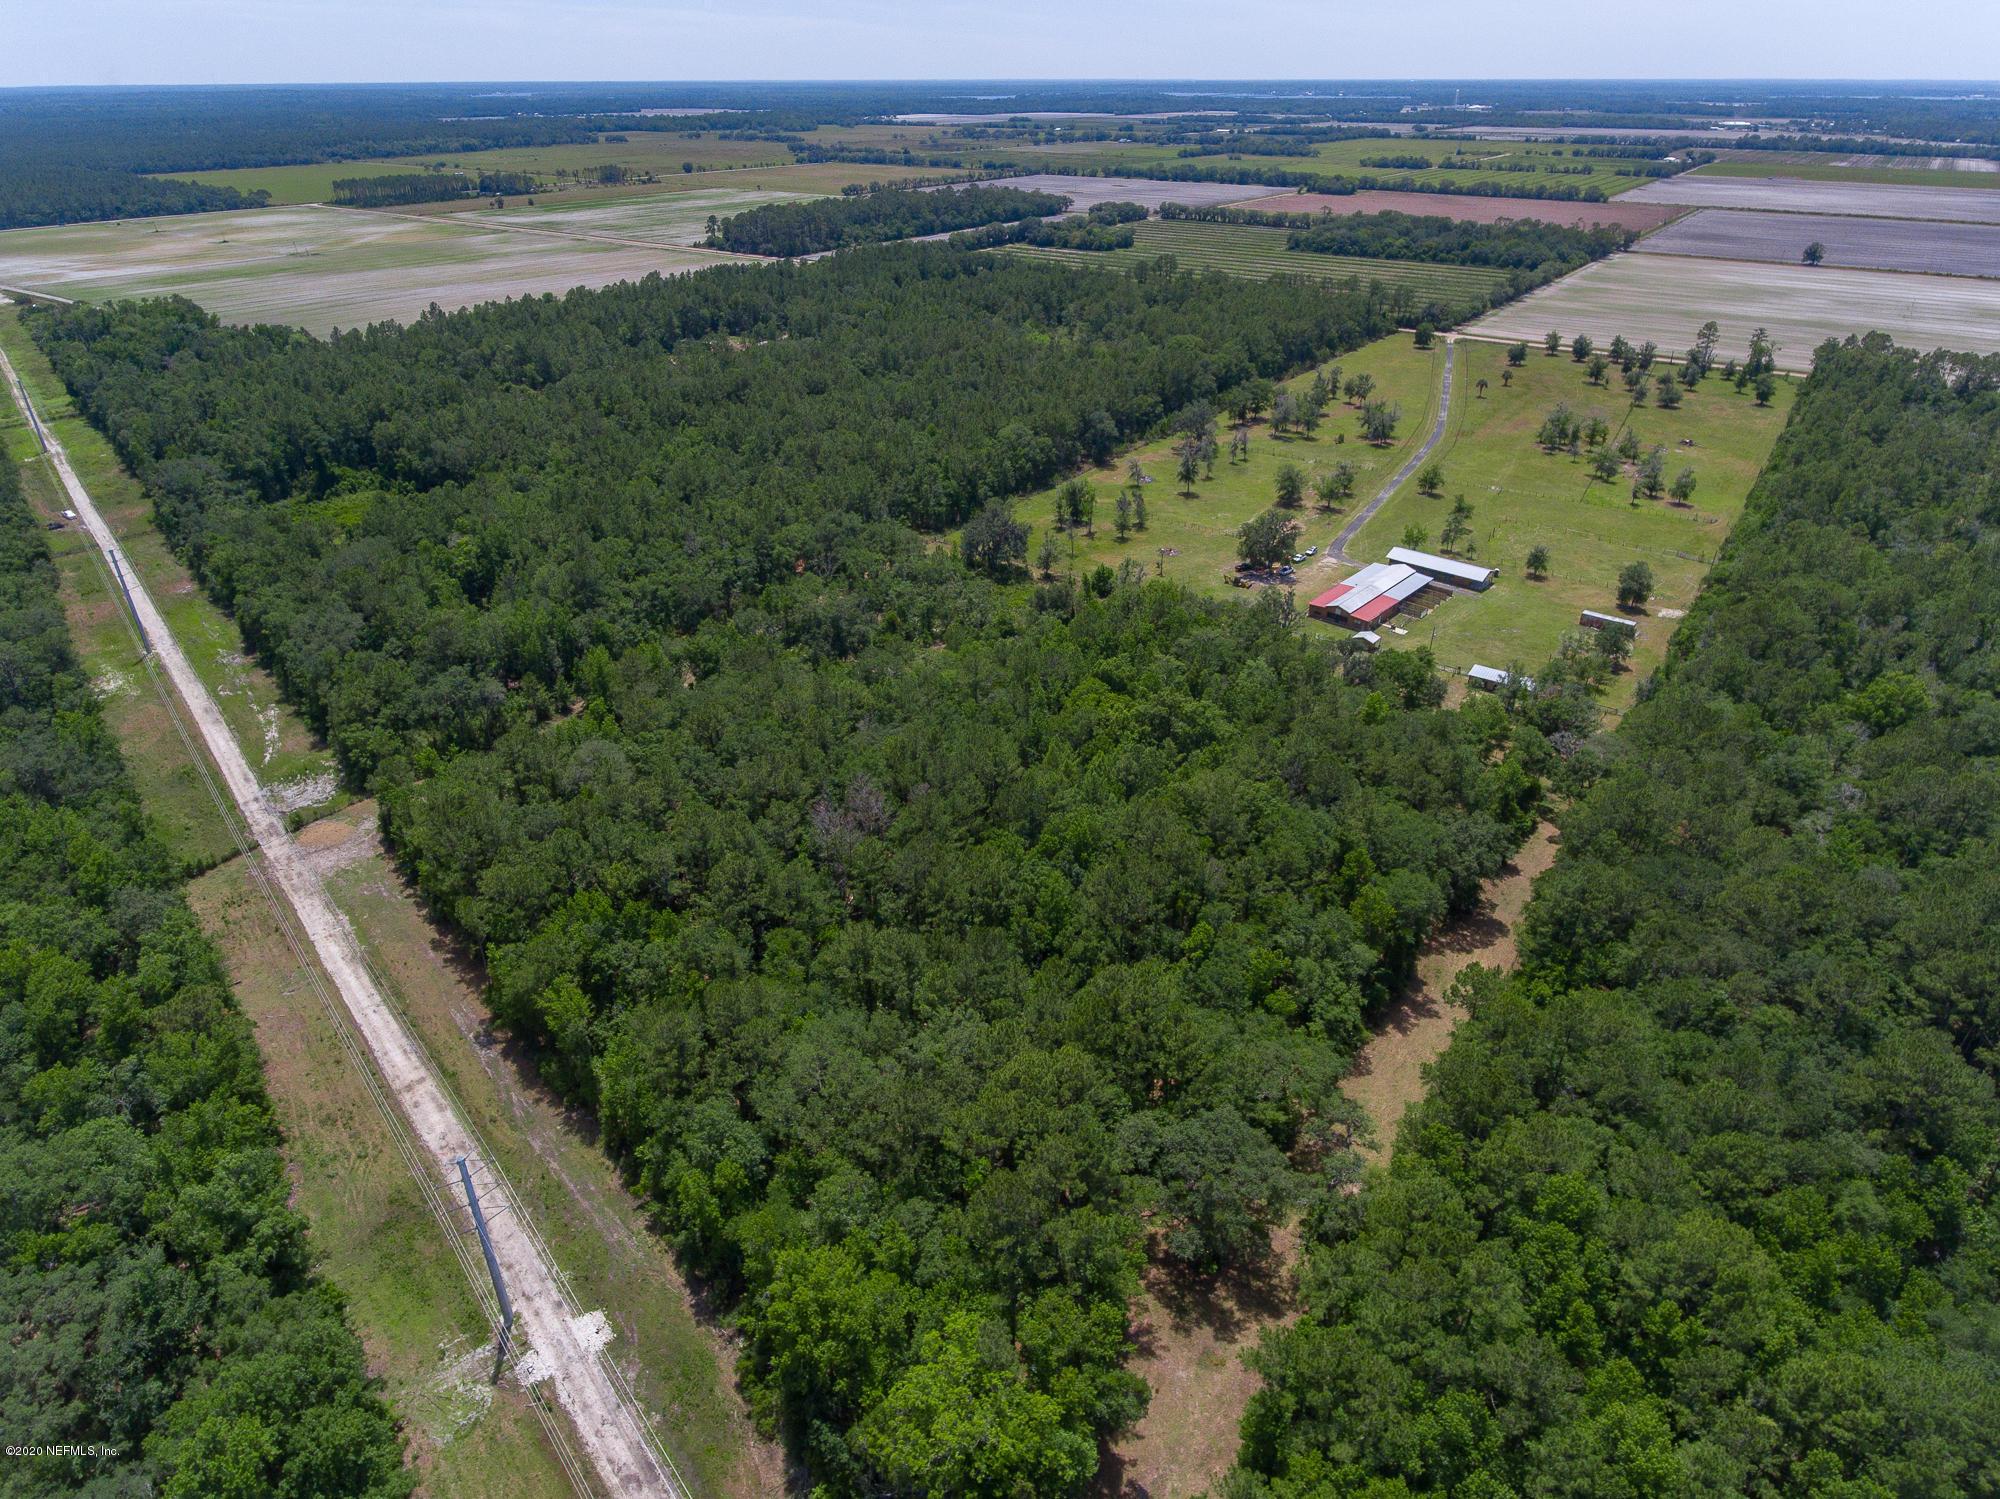 306 CRACKER SWAMP DIRT, EAST PALATKA, FLORIDA 32131, ,Vacant land,For sale,CRACKER SWAMP DIRT,1054837